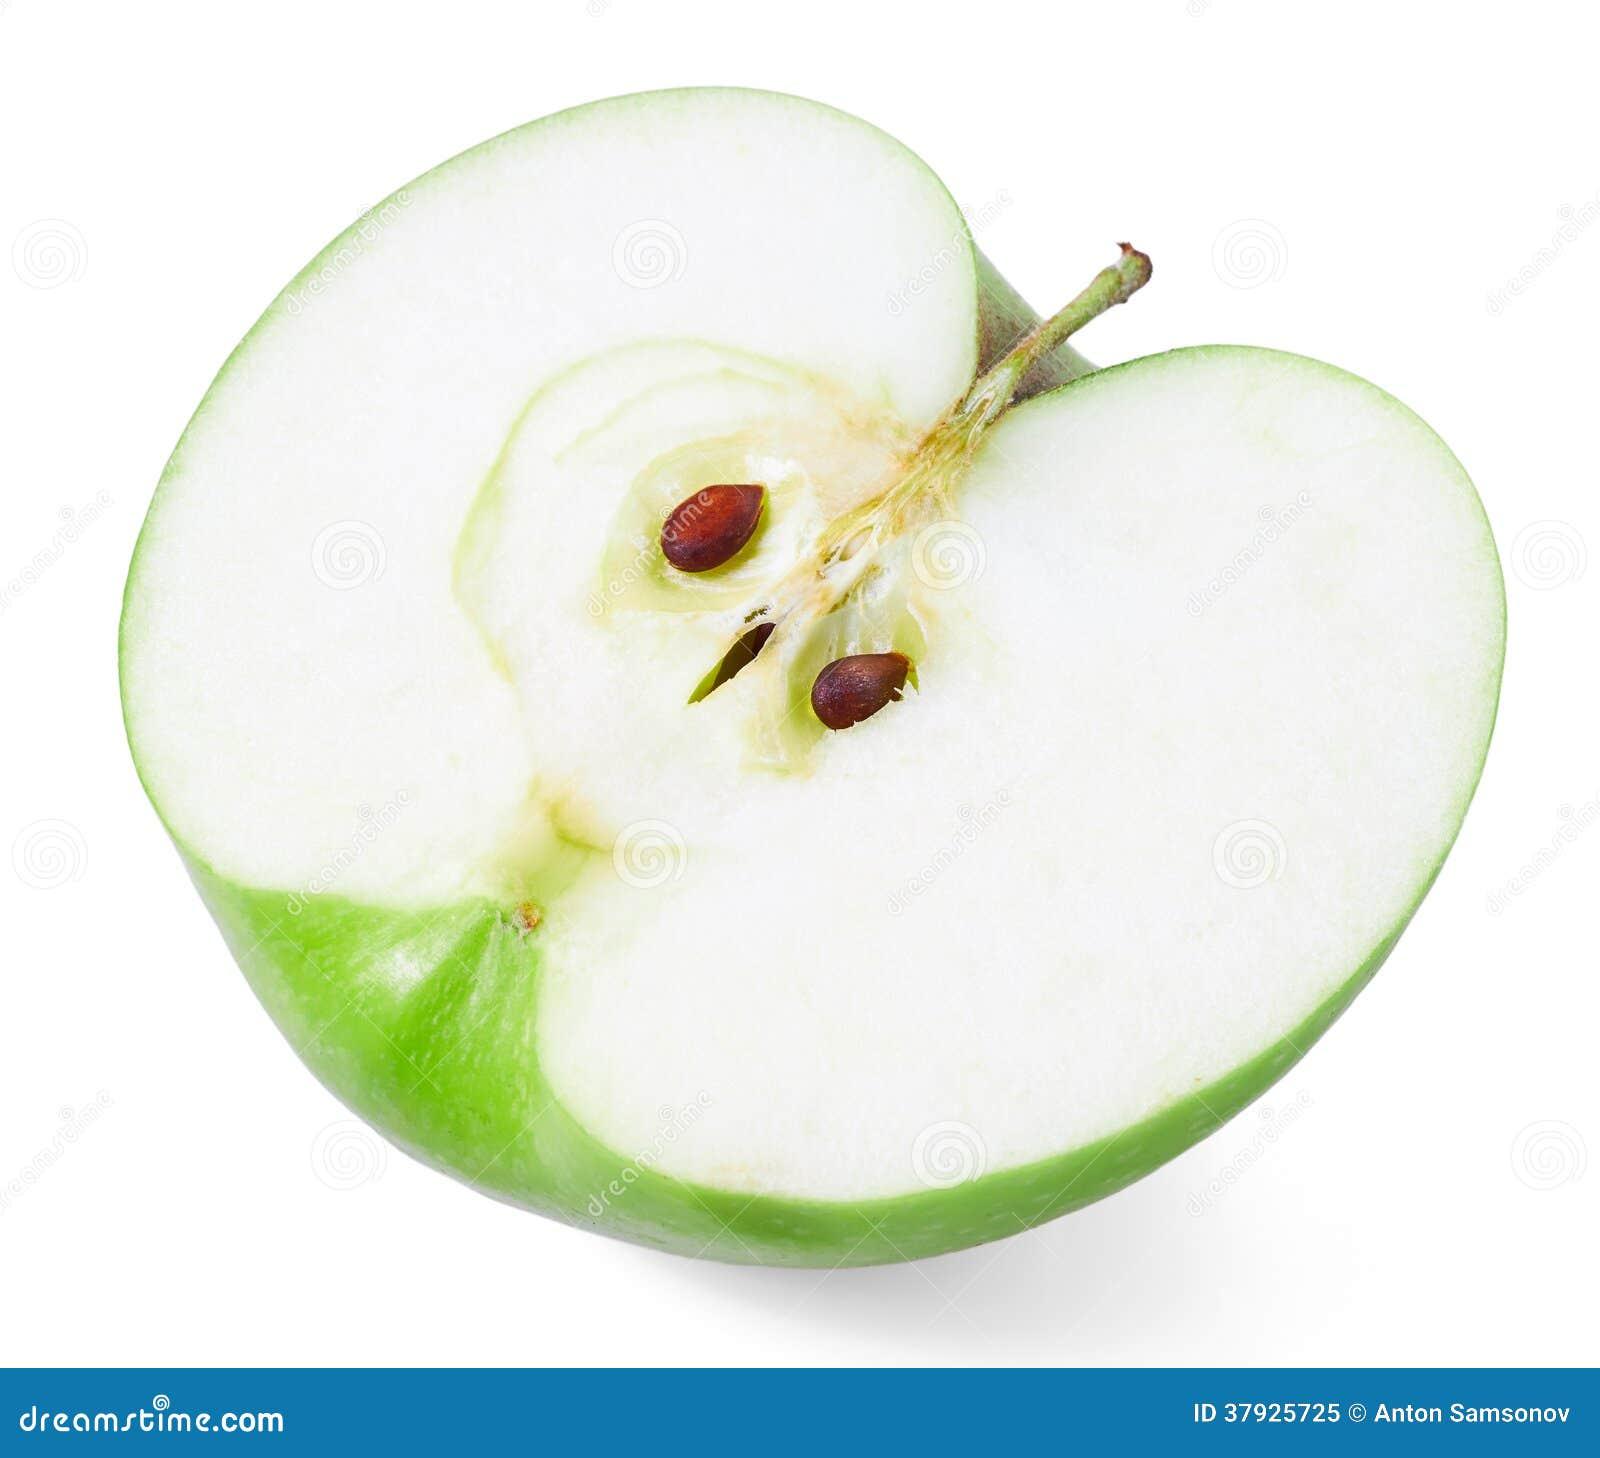 Halb grüner Apfel